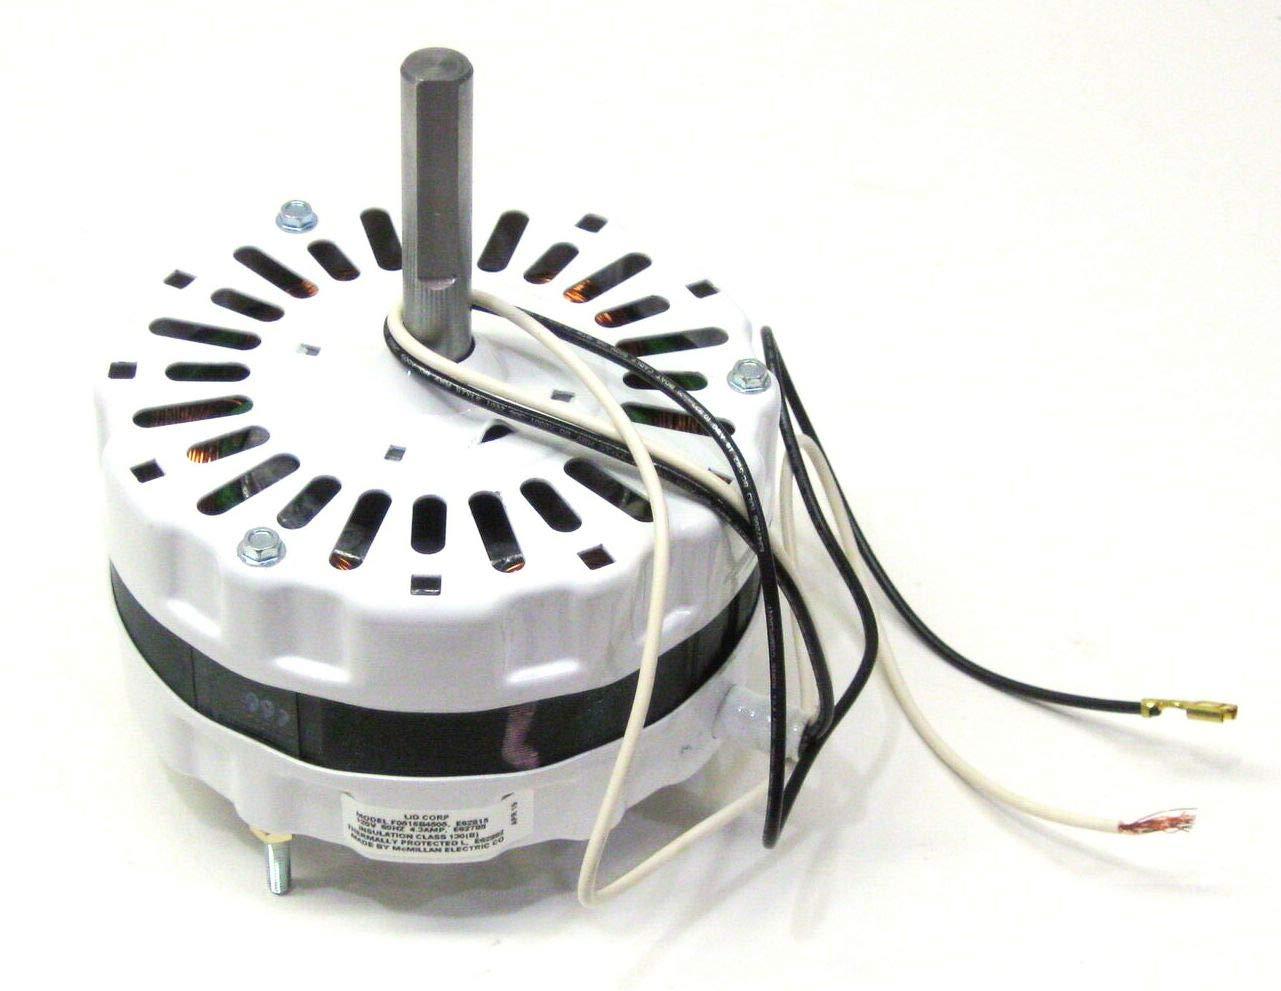 Motor 69317 Attic Fan Ventilator for Broan 97009317 99080267 White 5 Diameter